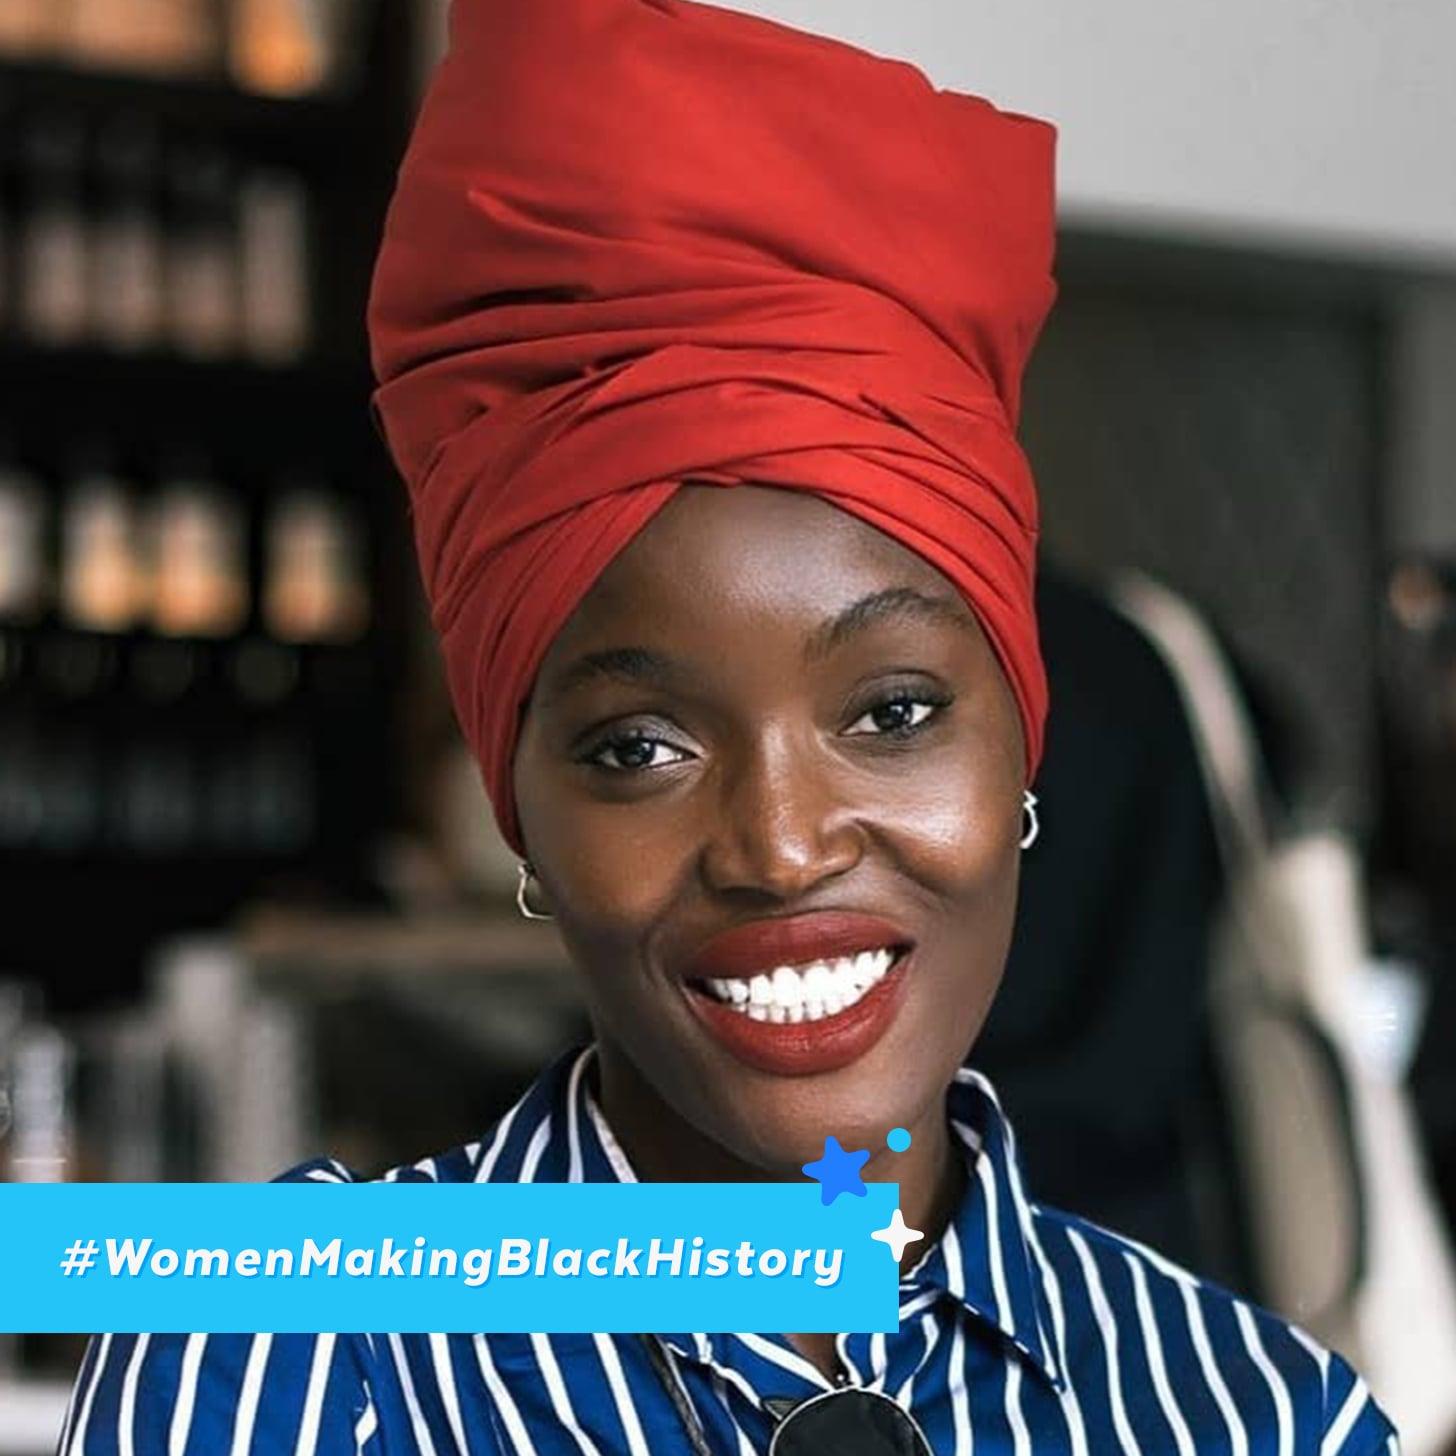 Folasade Adeoso Is Uplifting Women Through Design and Tech